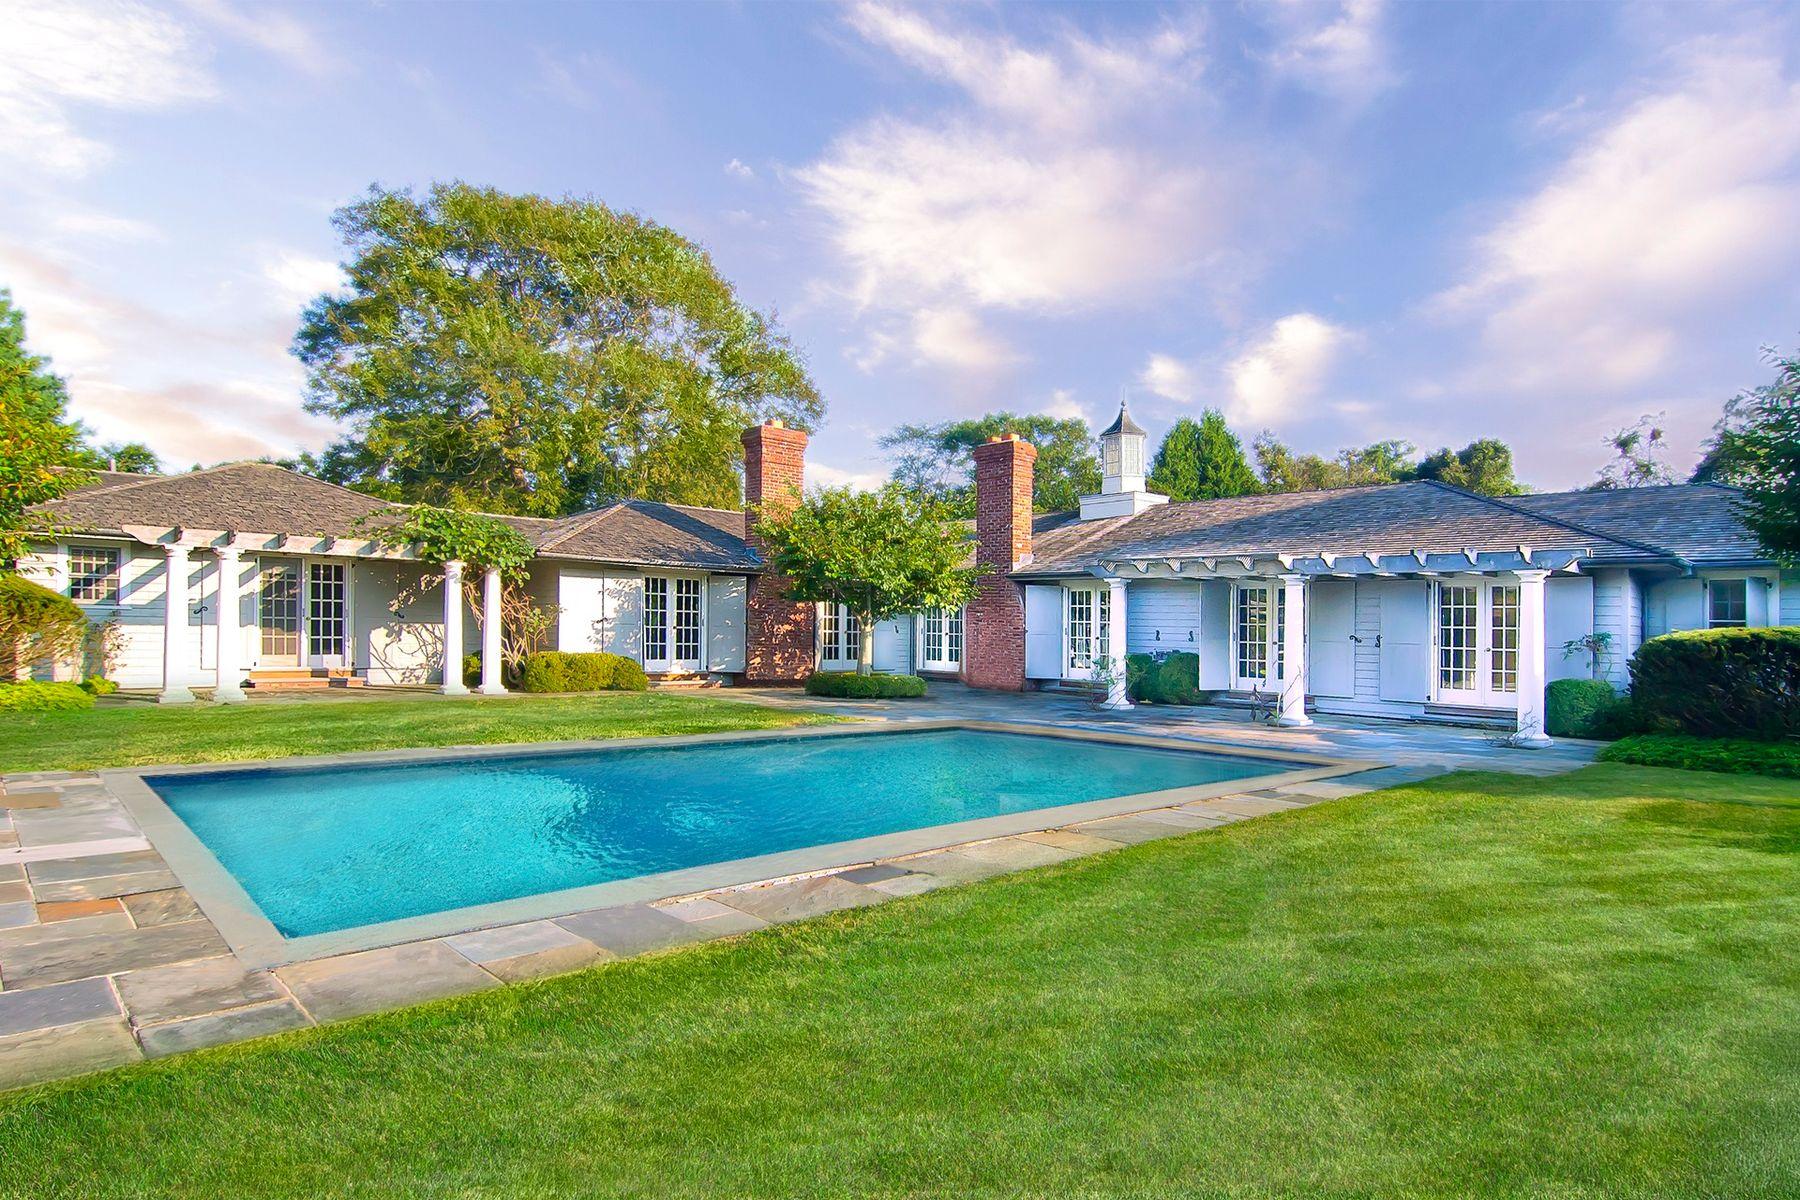 Single Family Home for Rent at East Hampton Village Living 70 Woods Lane East Hampton, New York 11937 United States